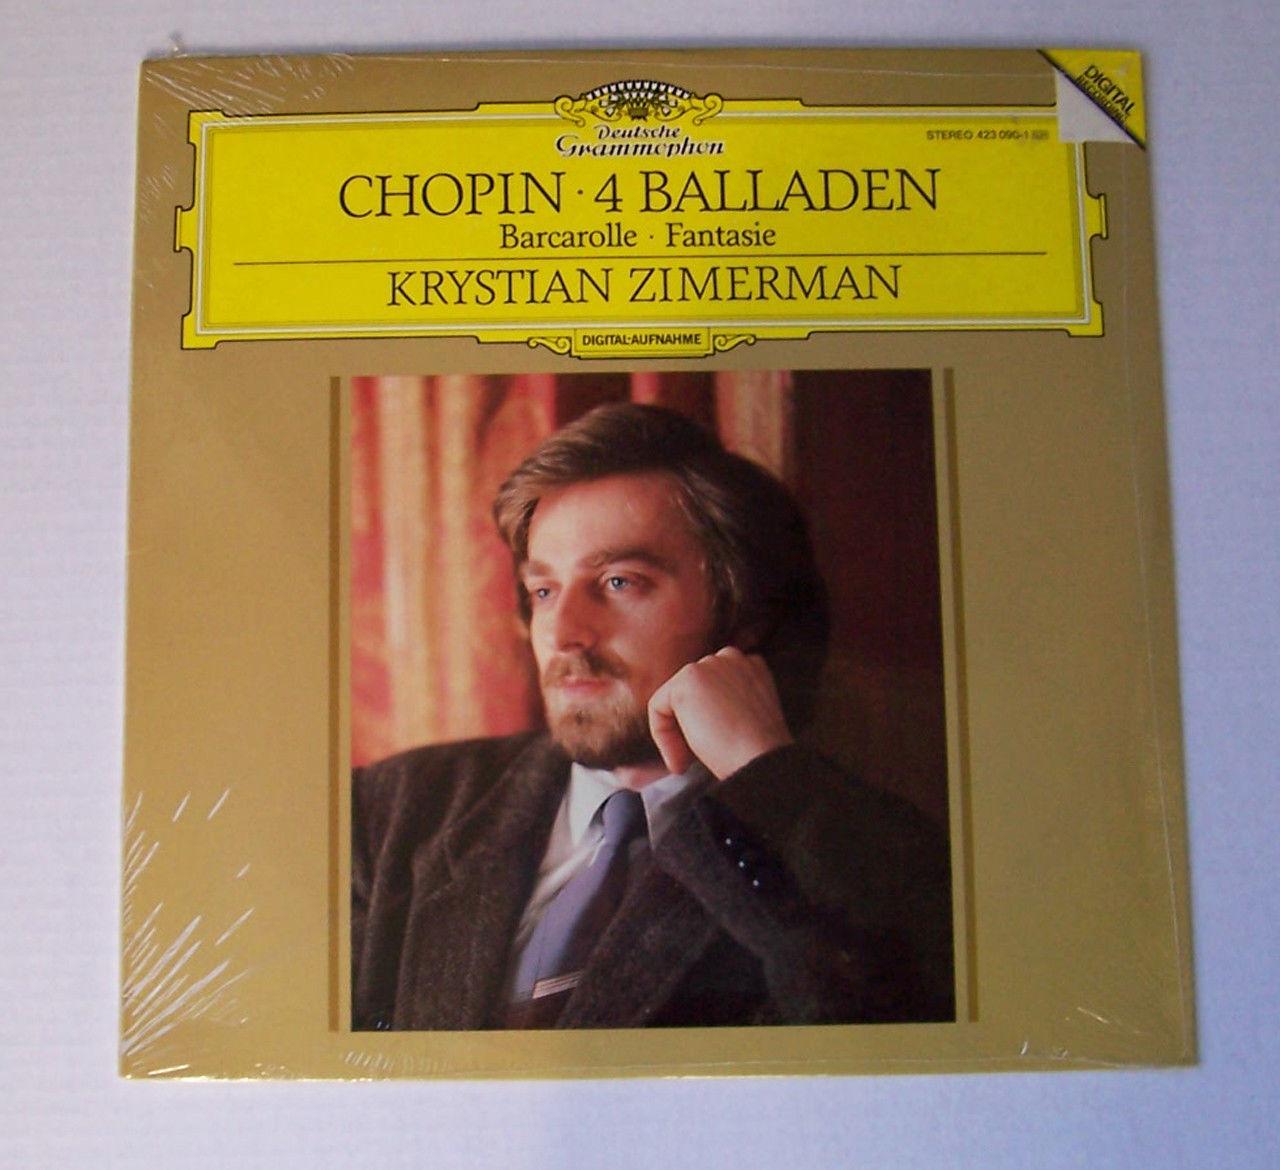 Krystian Zimerman Chopin 4 Balladen Vinyl Original 1st US Press '88 DG 423 090-1